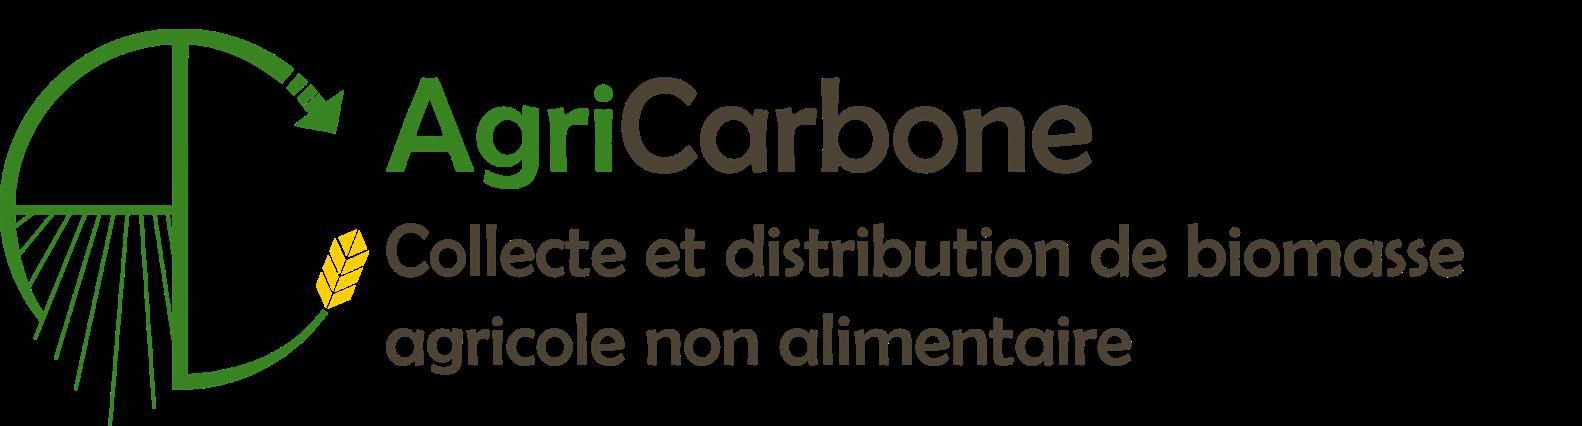 logo AgriCarbone